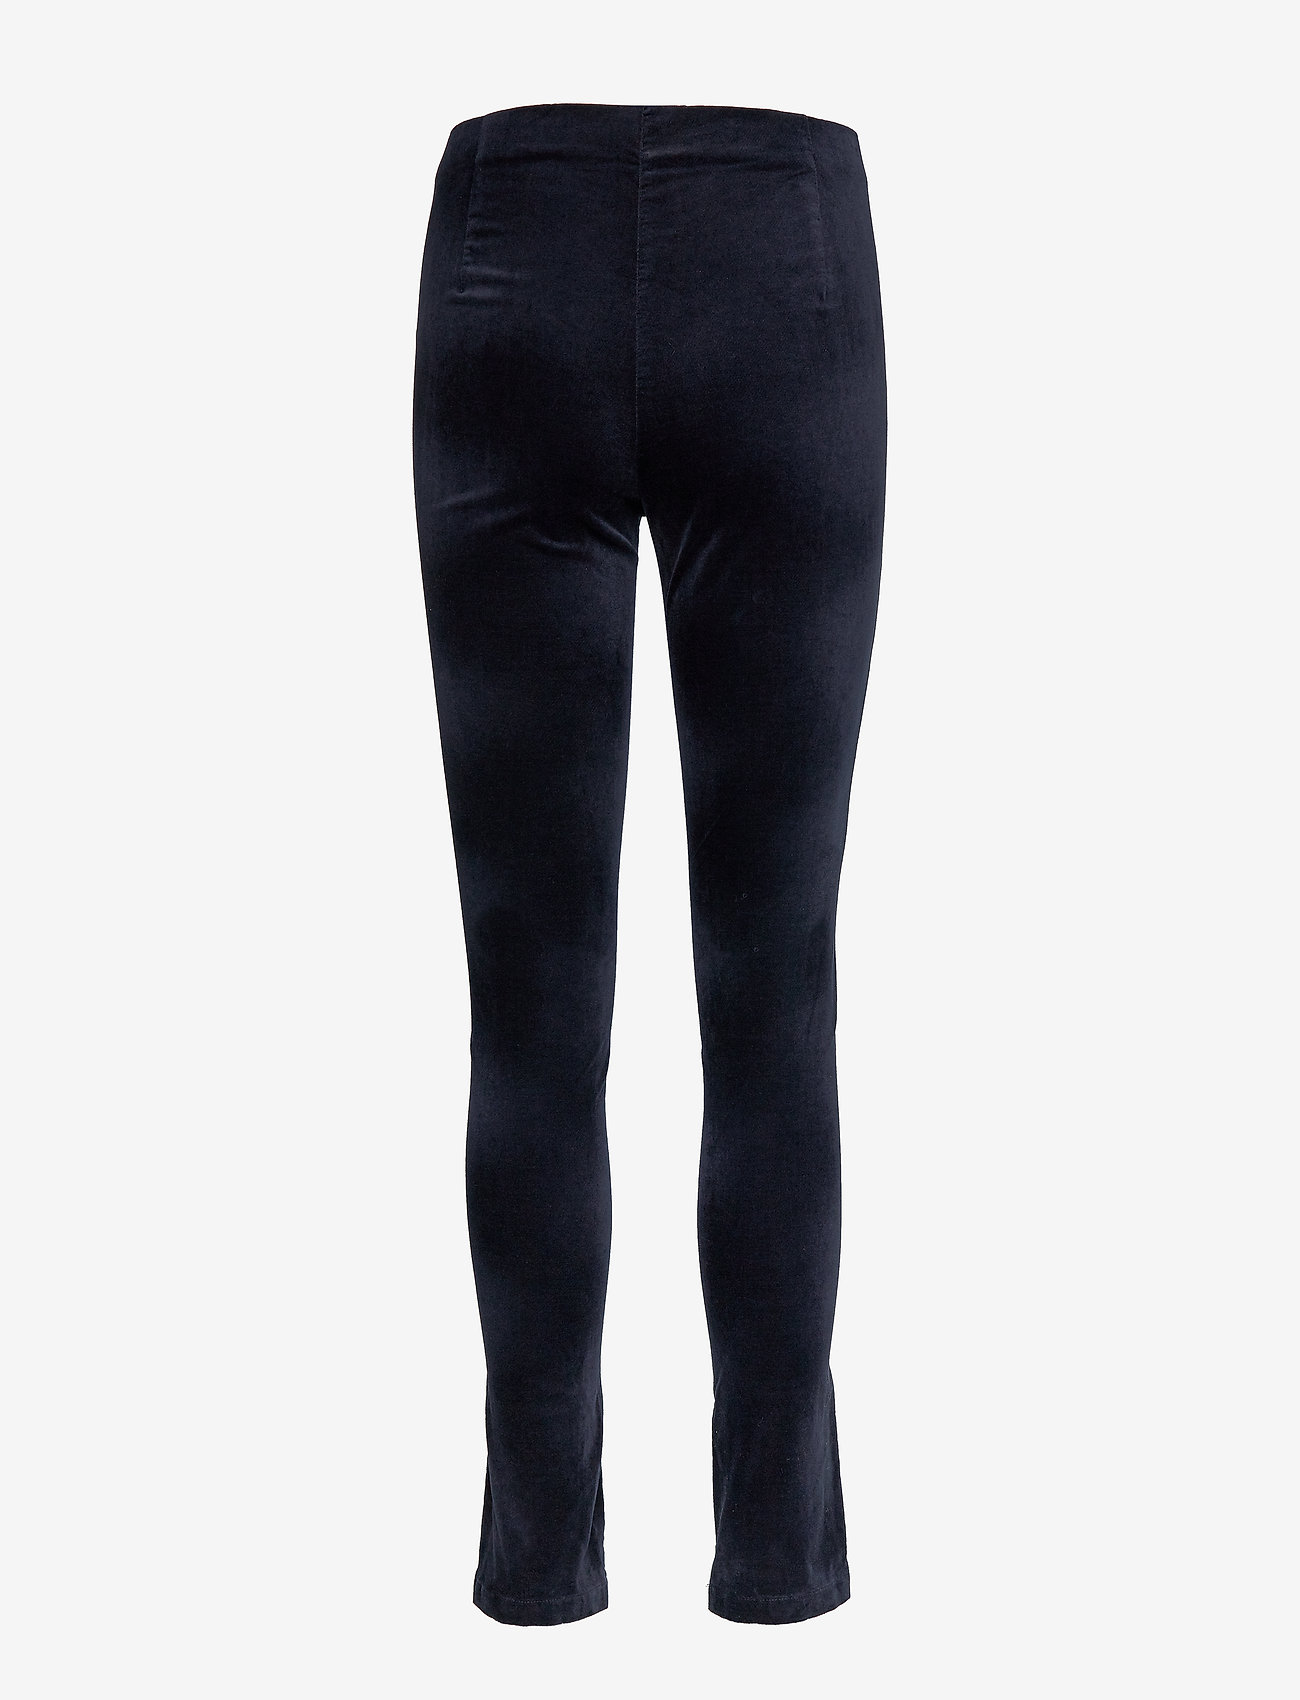 Rosemunde - Trousers - smale busker - dark blue - 1